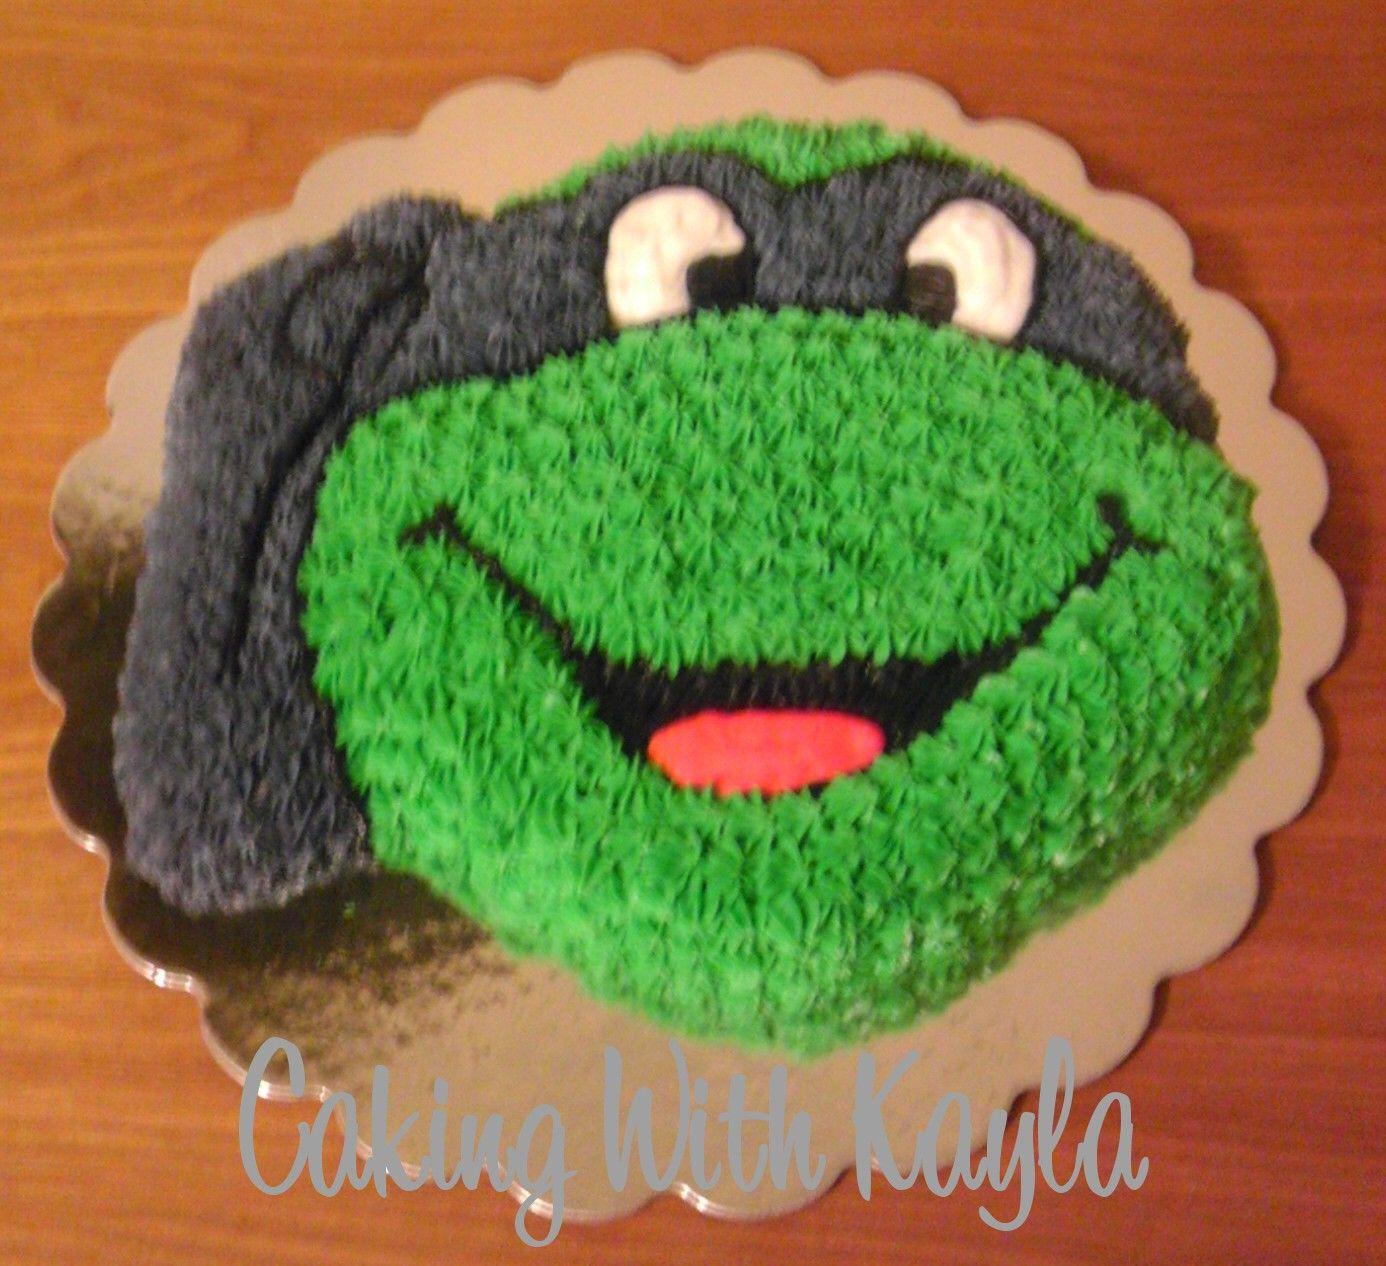 Ninja Turtles Cakes At Walmart Birthday Cook Pinterest Cake